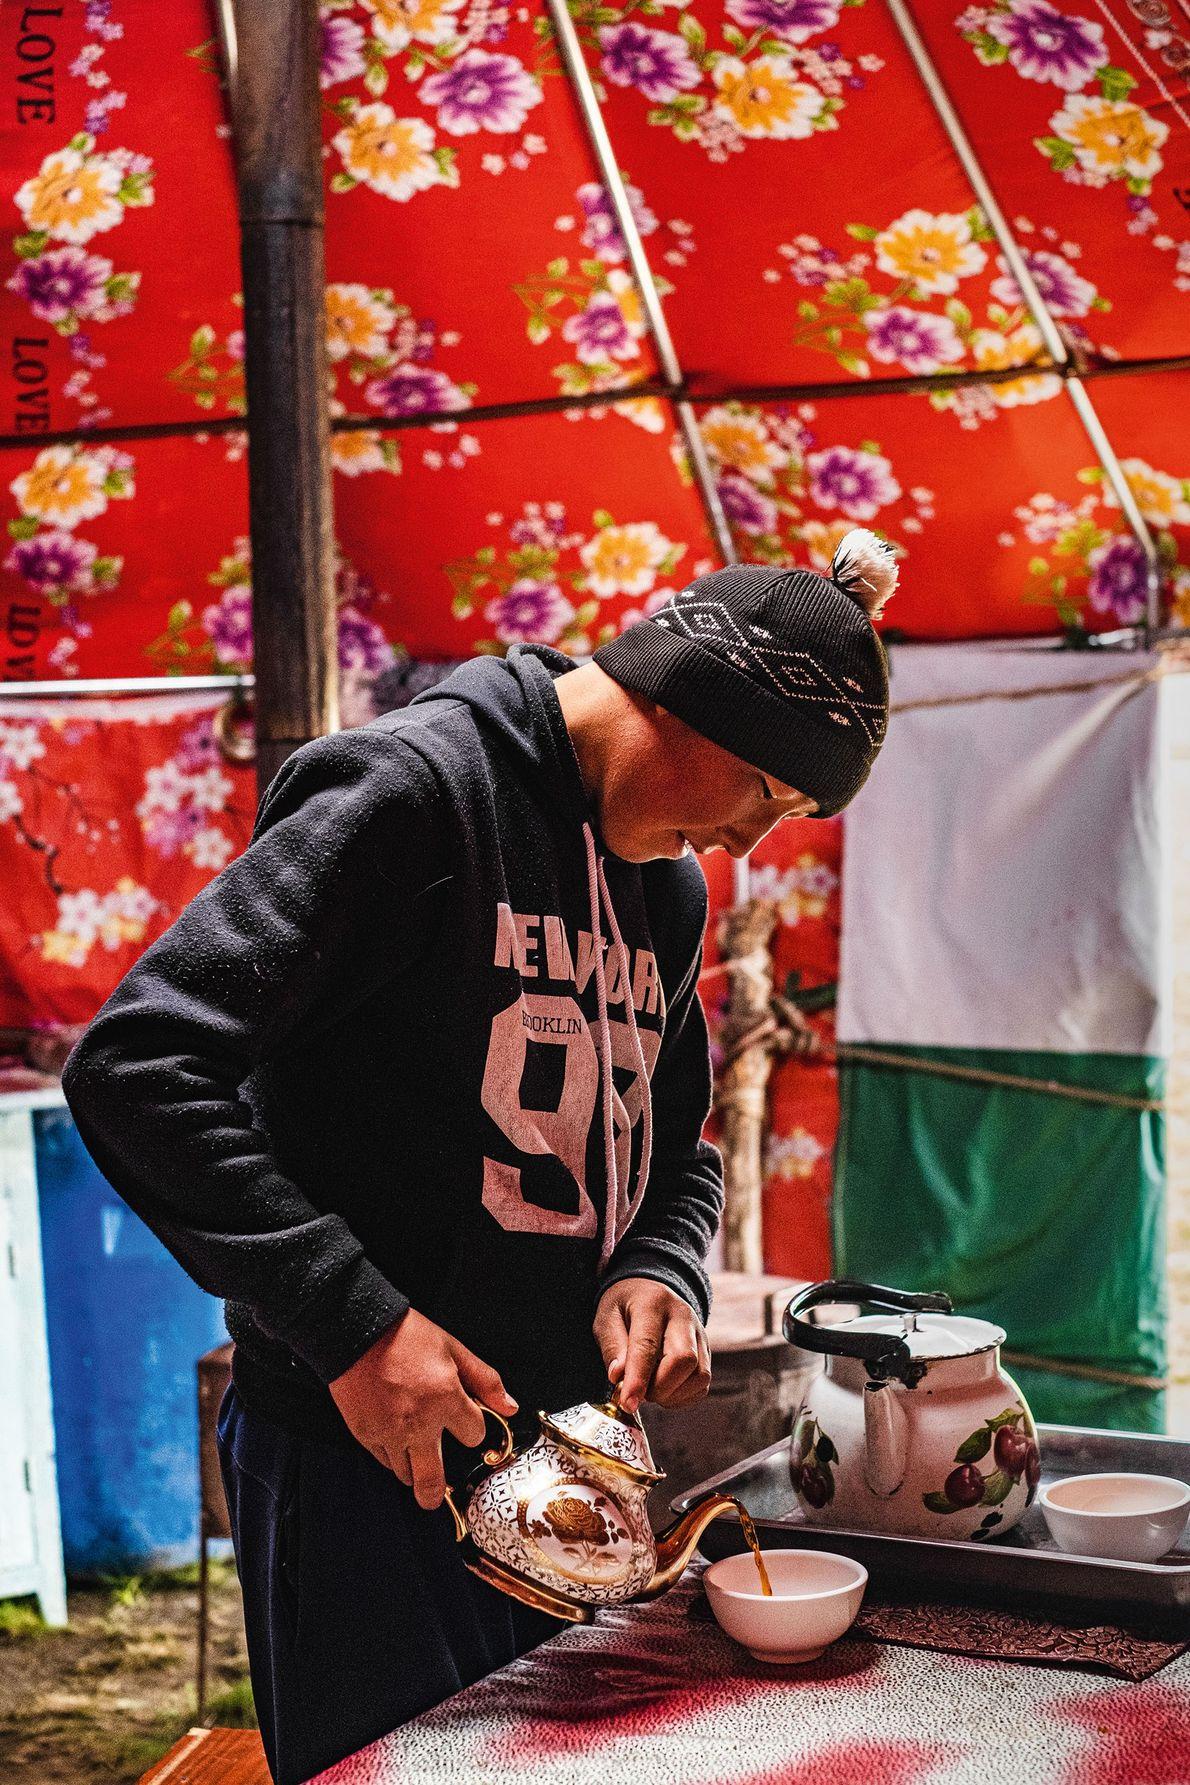 Umutkor's older son, Nurbek, pours tea. In Kyrgyz households, tea is nearly as popular a drink ...